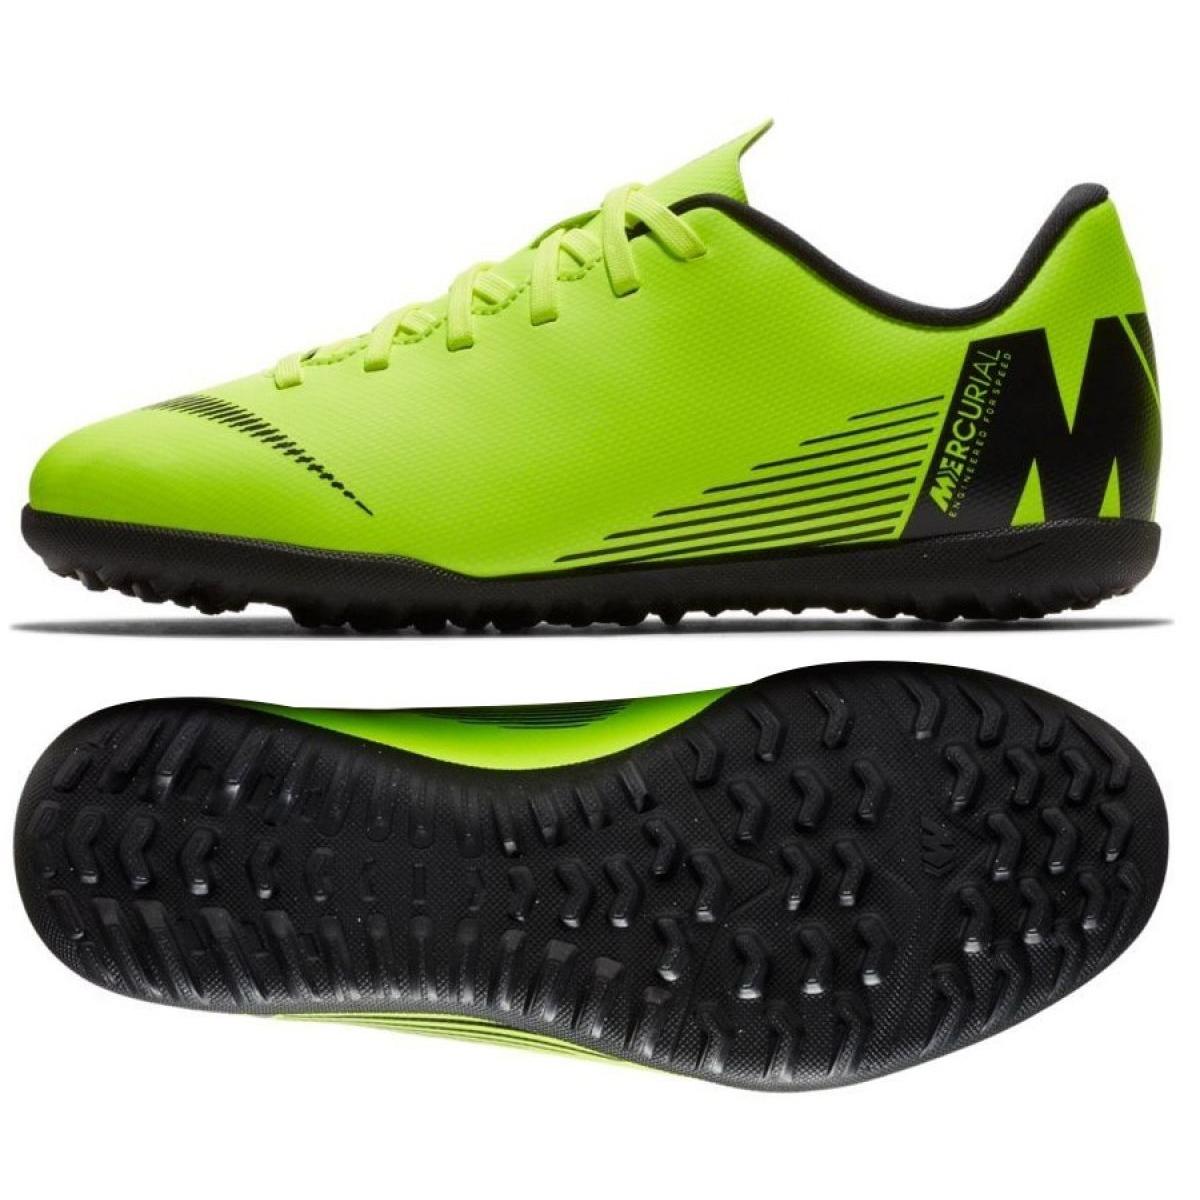 protestante Cuidar bofetada  Nike Mercurial Vapor X 12 Club Tf Jr AH7355-701 Football Shoes green green  - ButyModne.pl